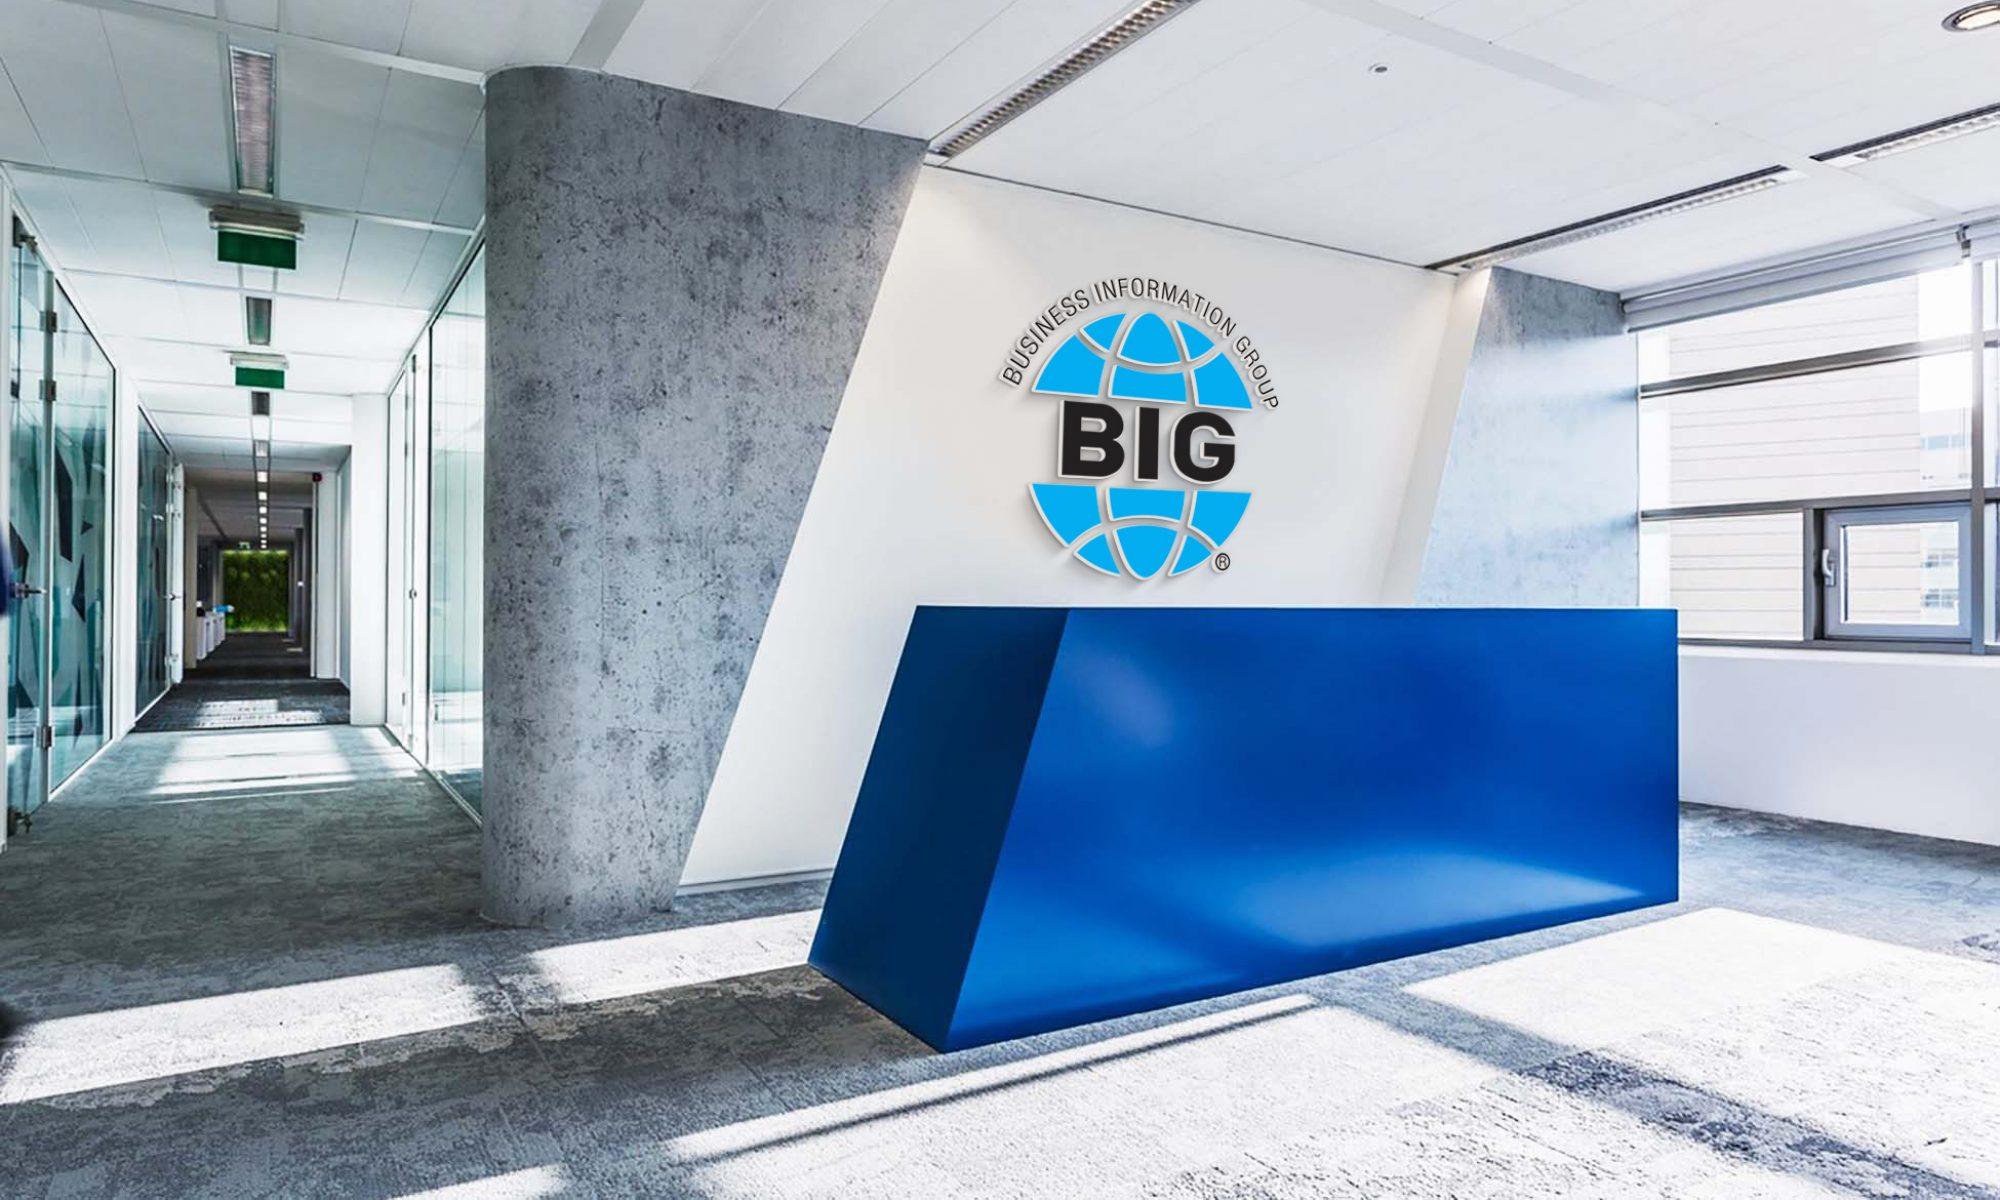 BIG - Business Information Group